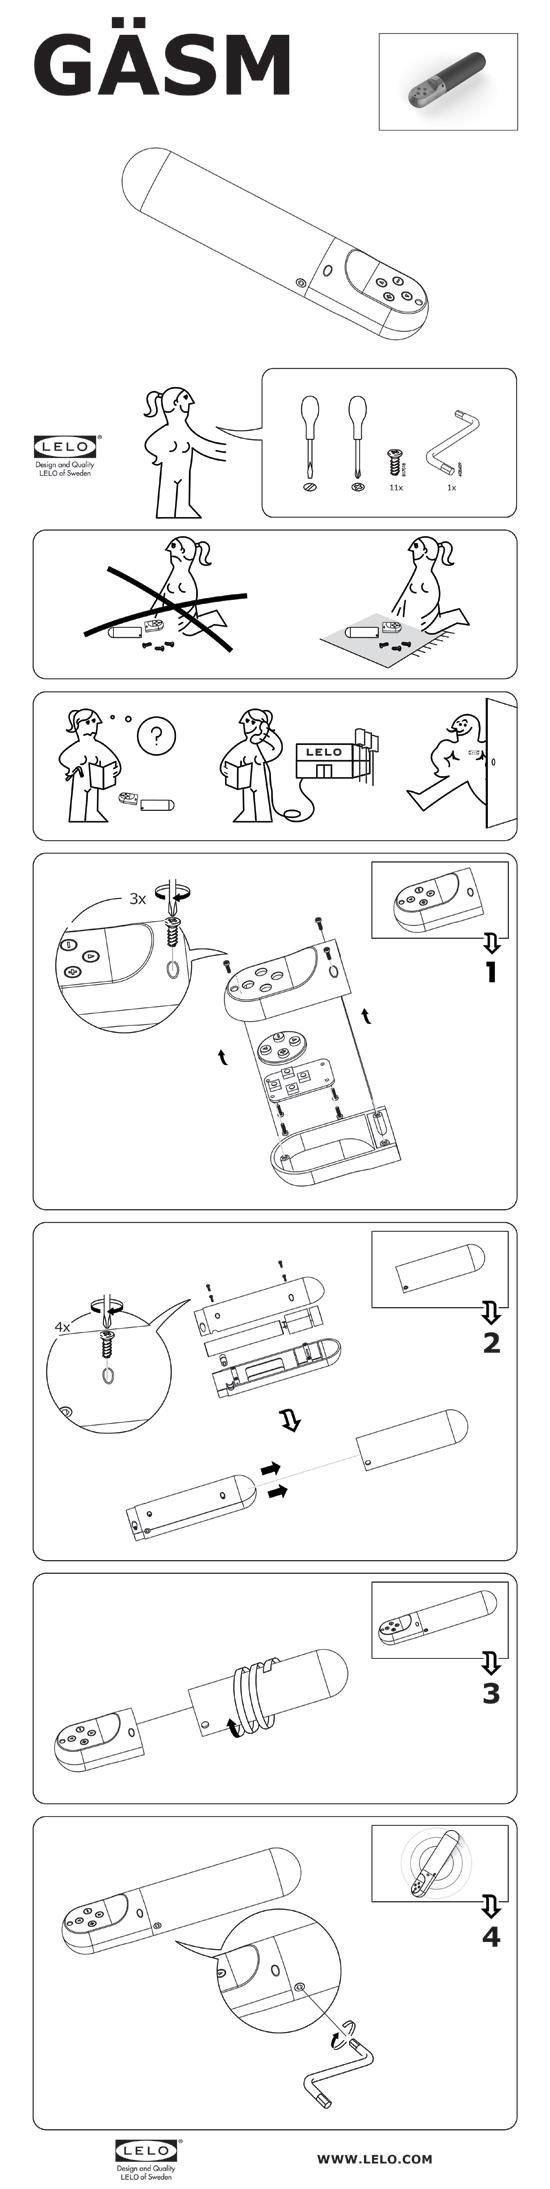 GASM Instructions 130328 GӒSM   ekologiczny wibrator LELO